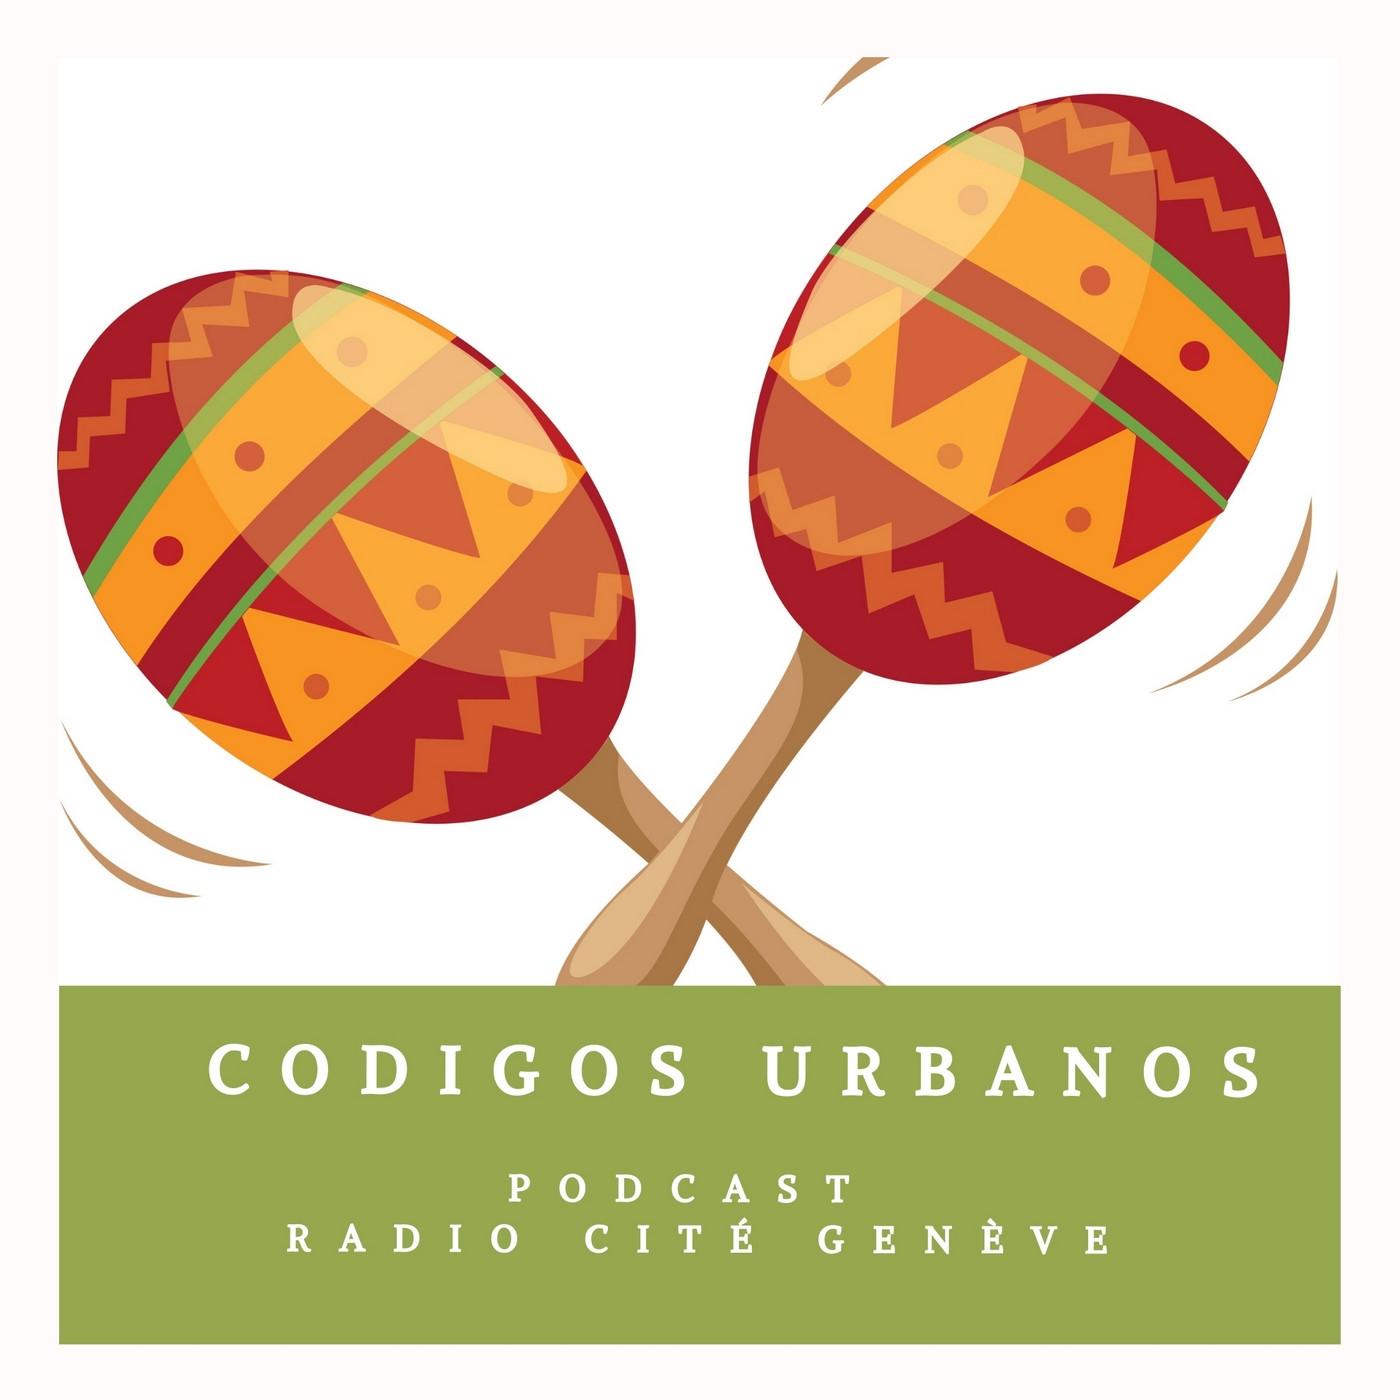 Codigos Urbanos - 24/11/20